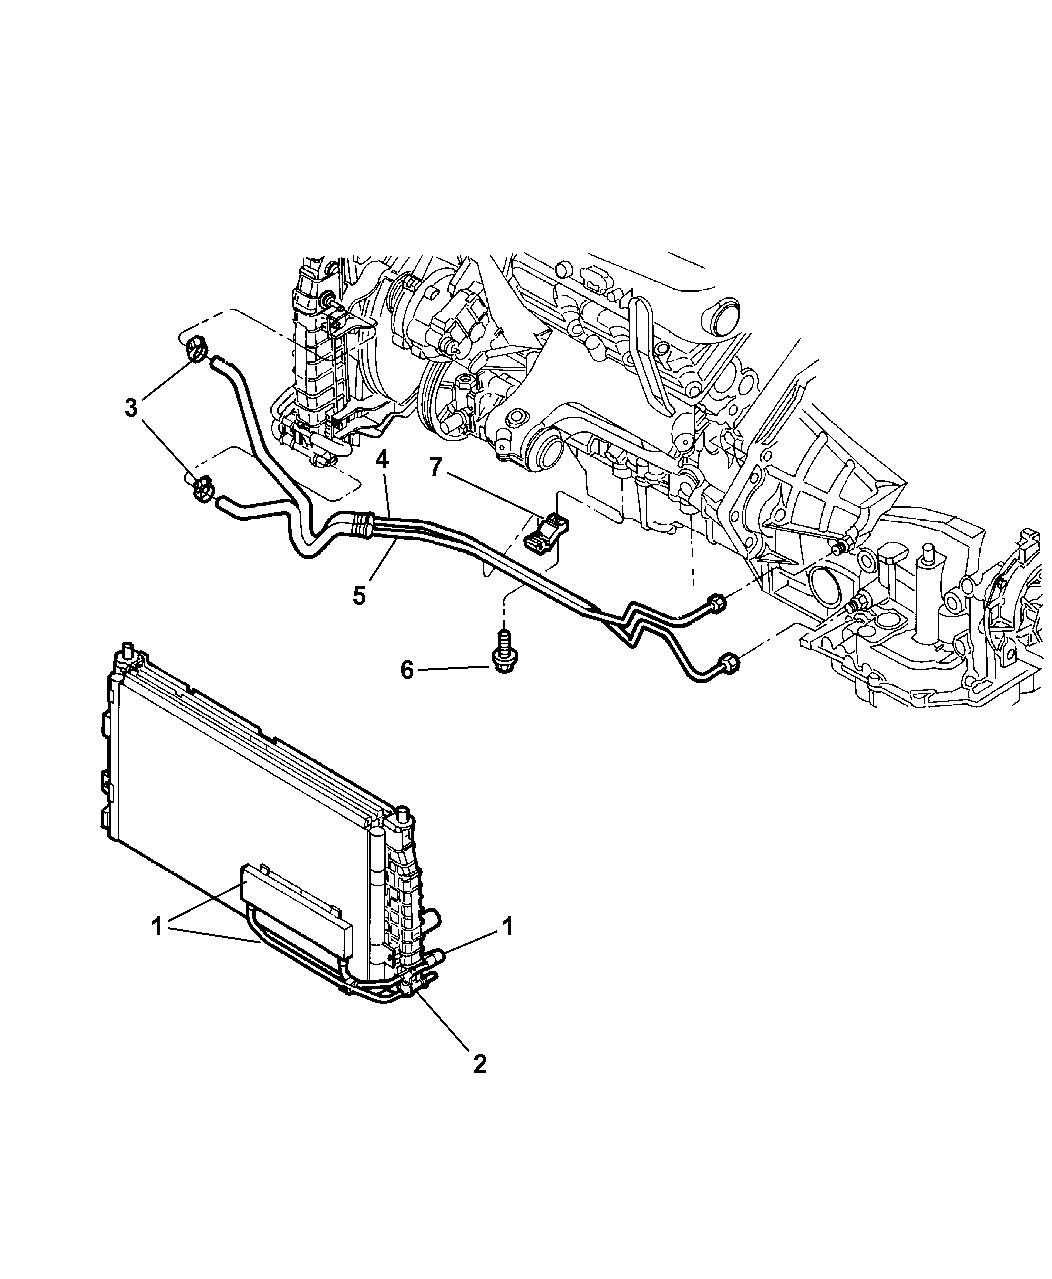 Chrysler 300m Transmission Oil Cooler